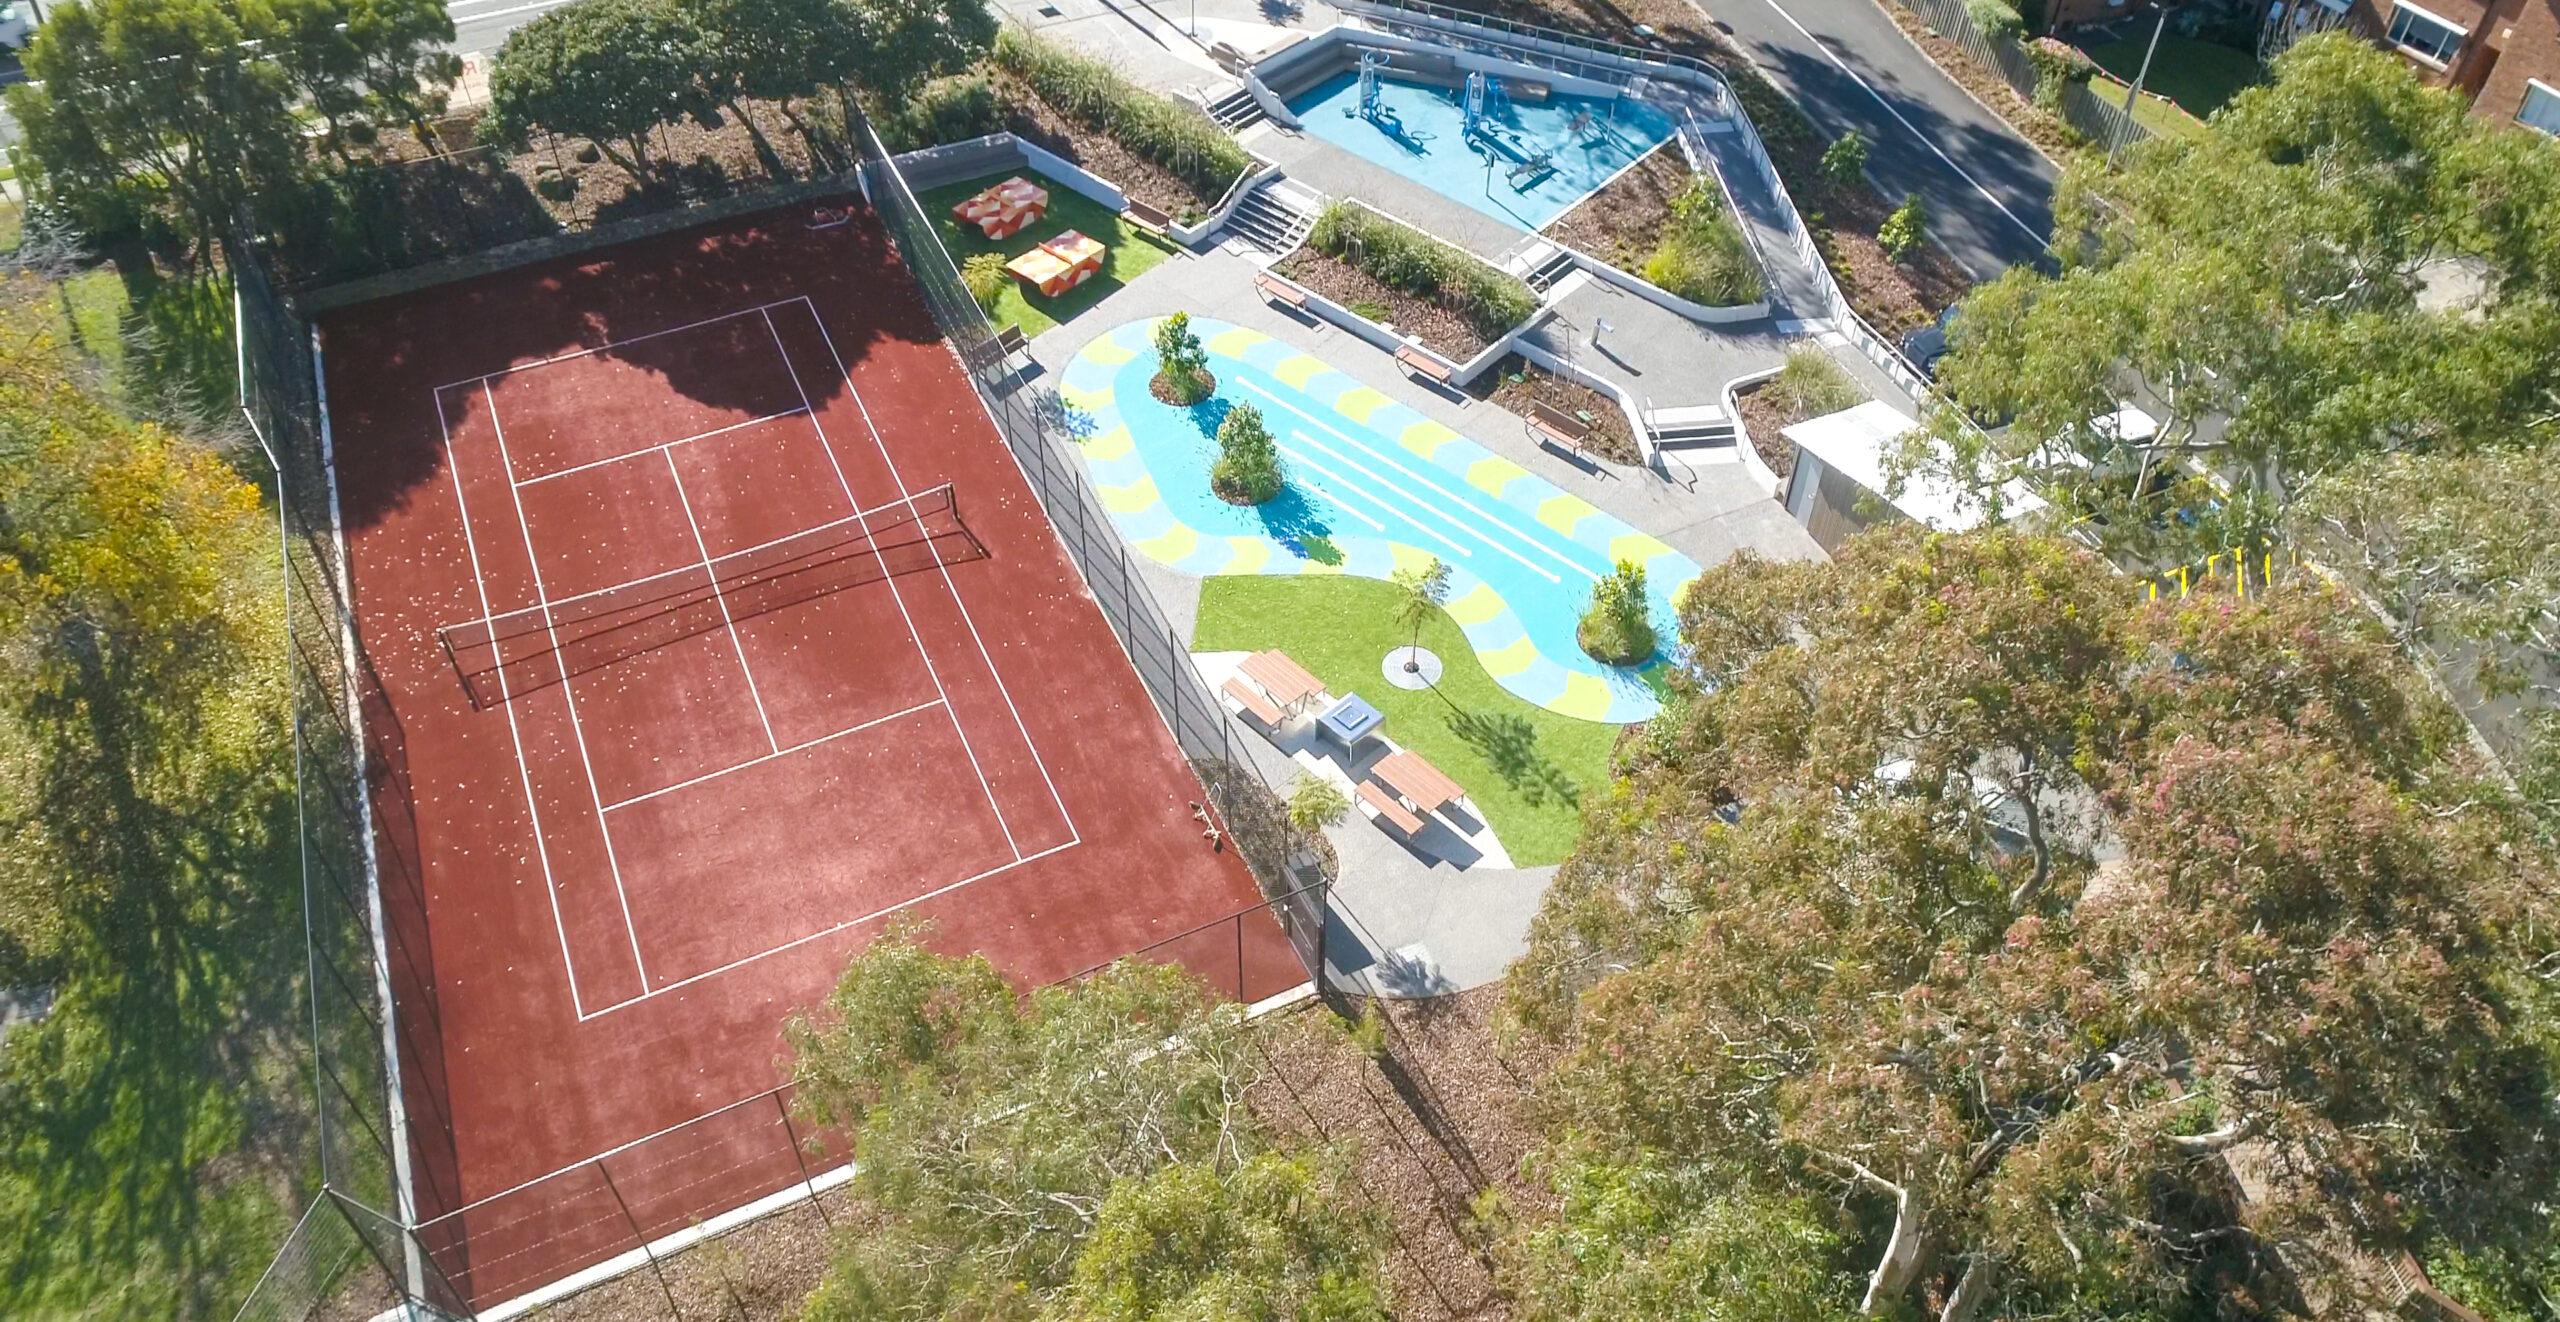 Tennis Court Landscaping